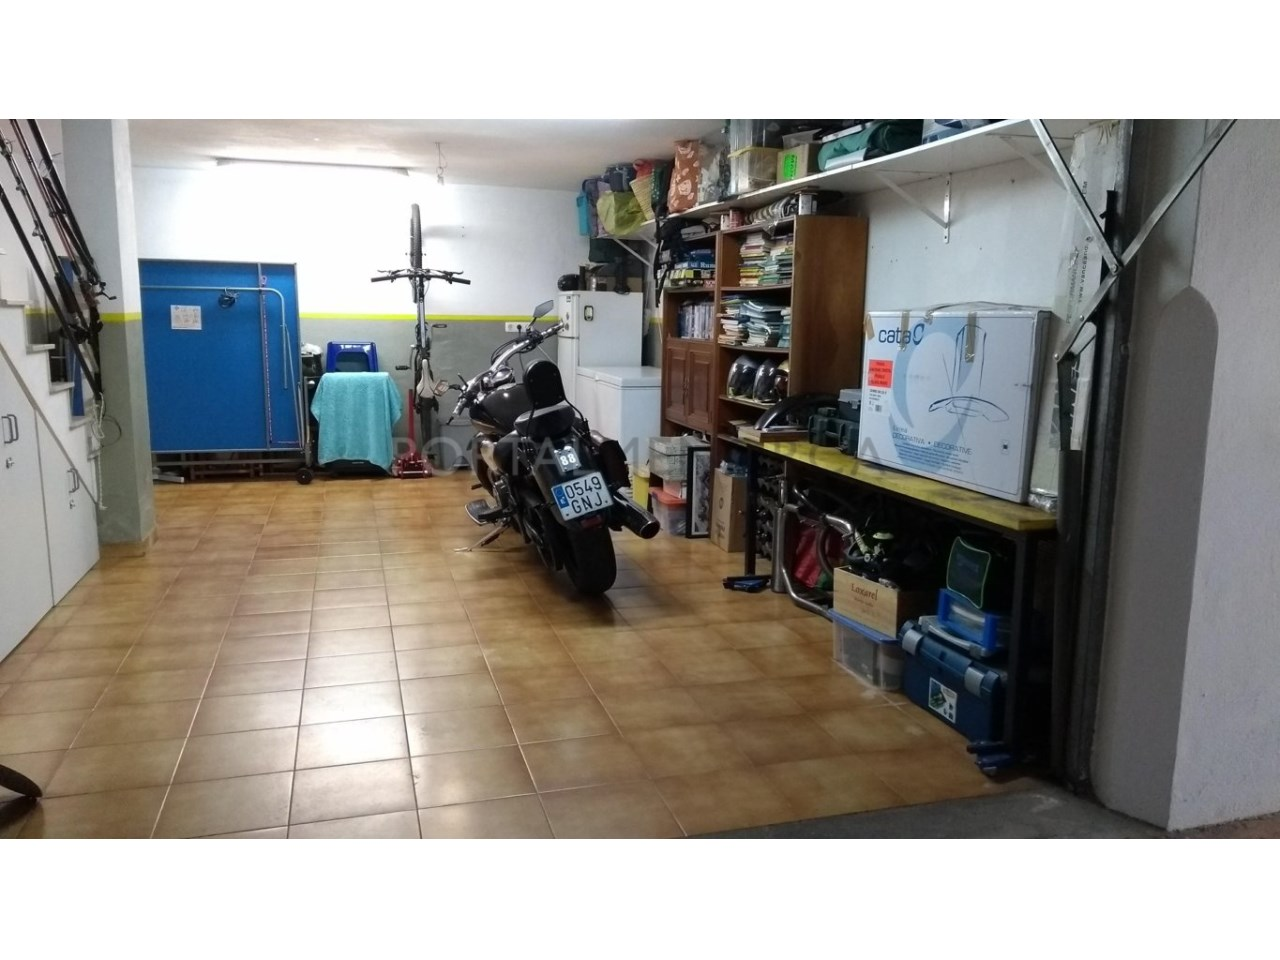 Charming villa with garage in Son Oleo for sale-Garage